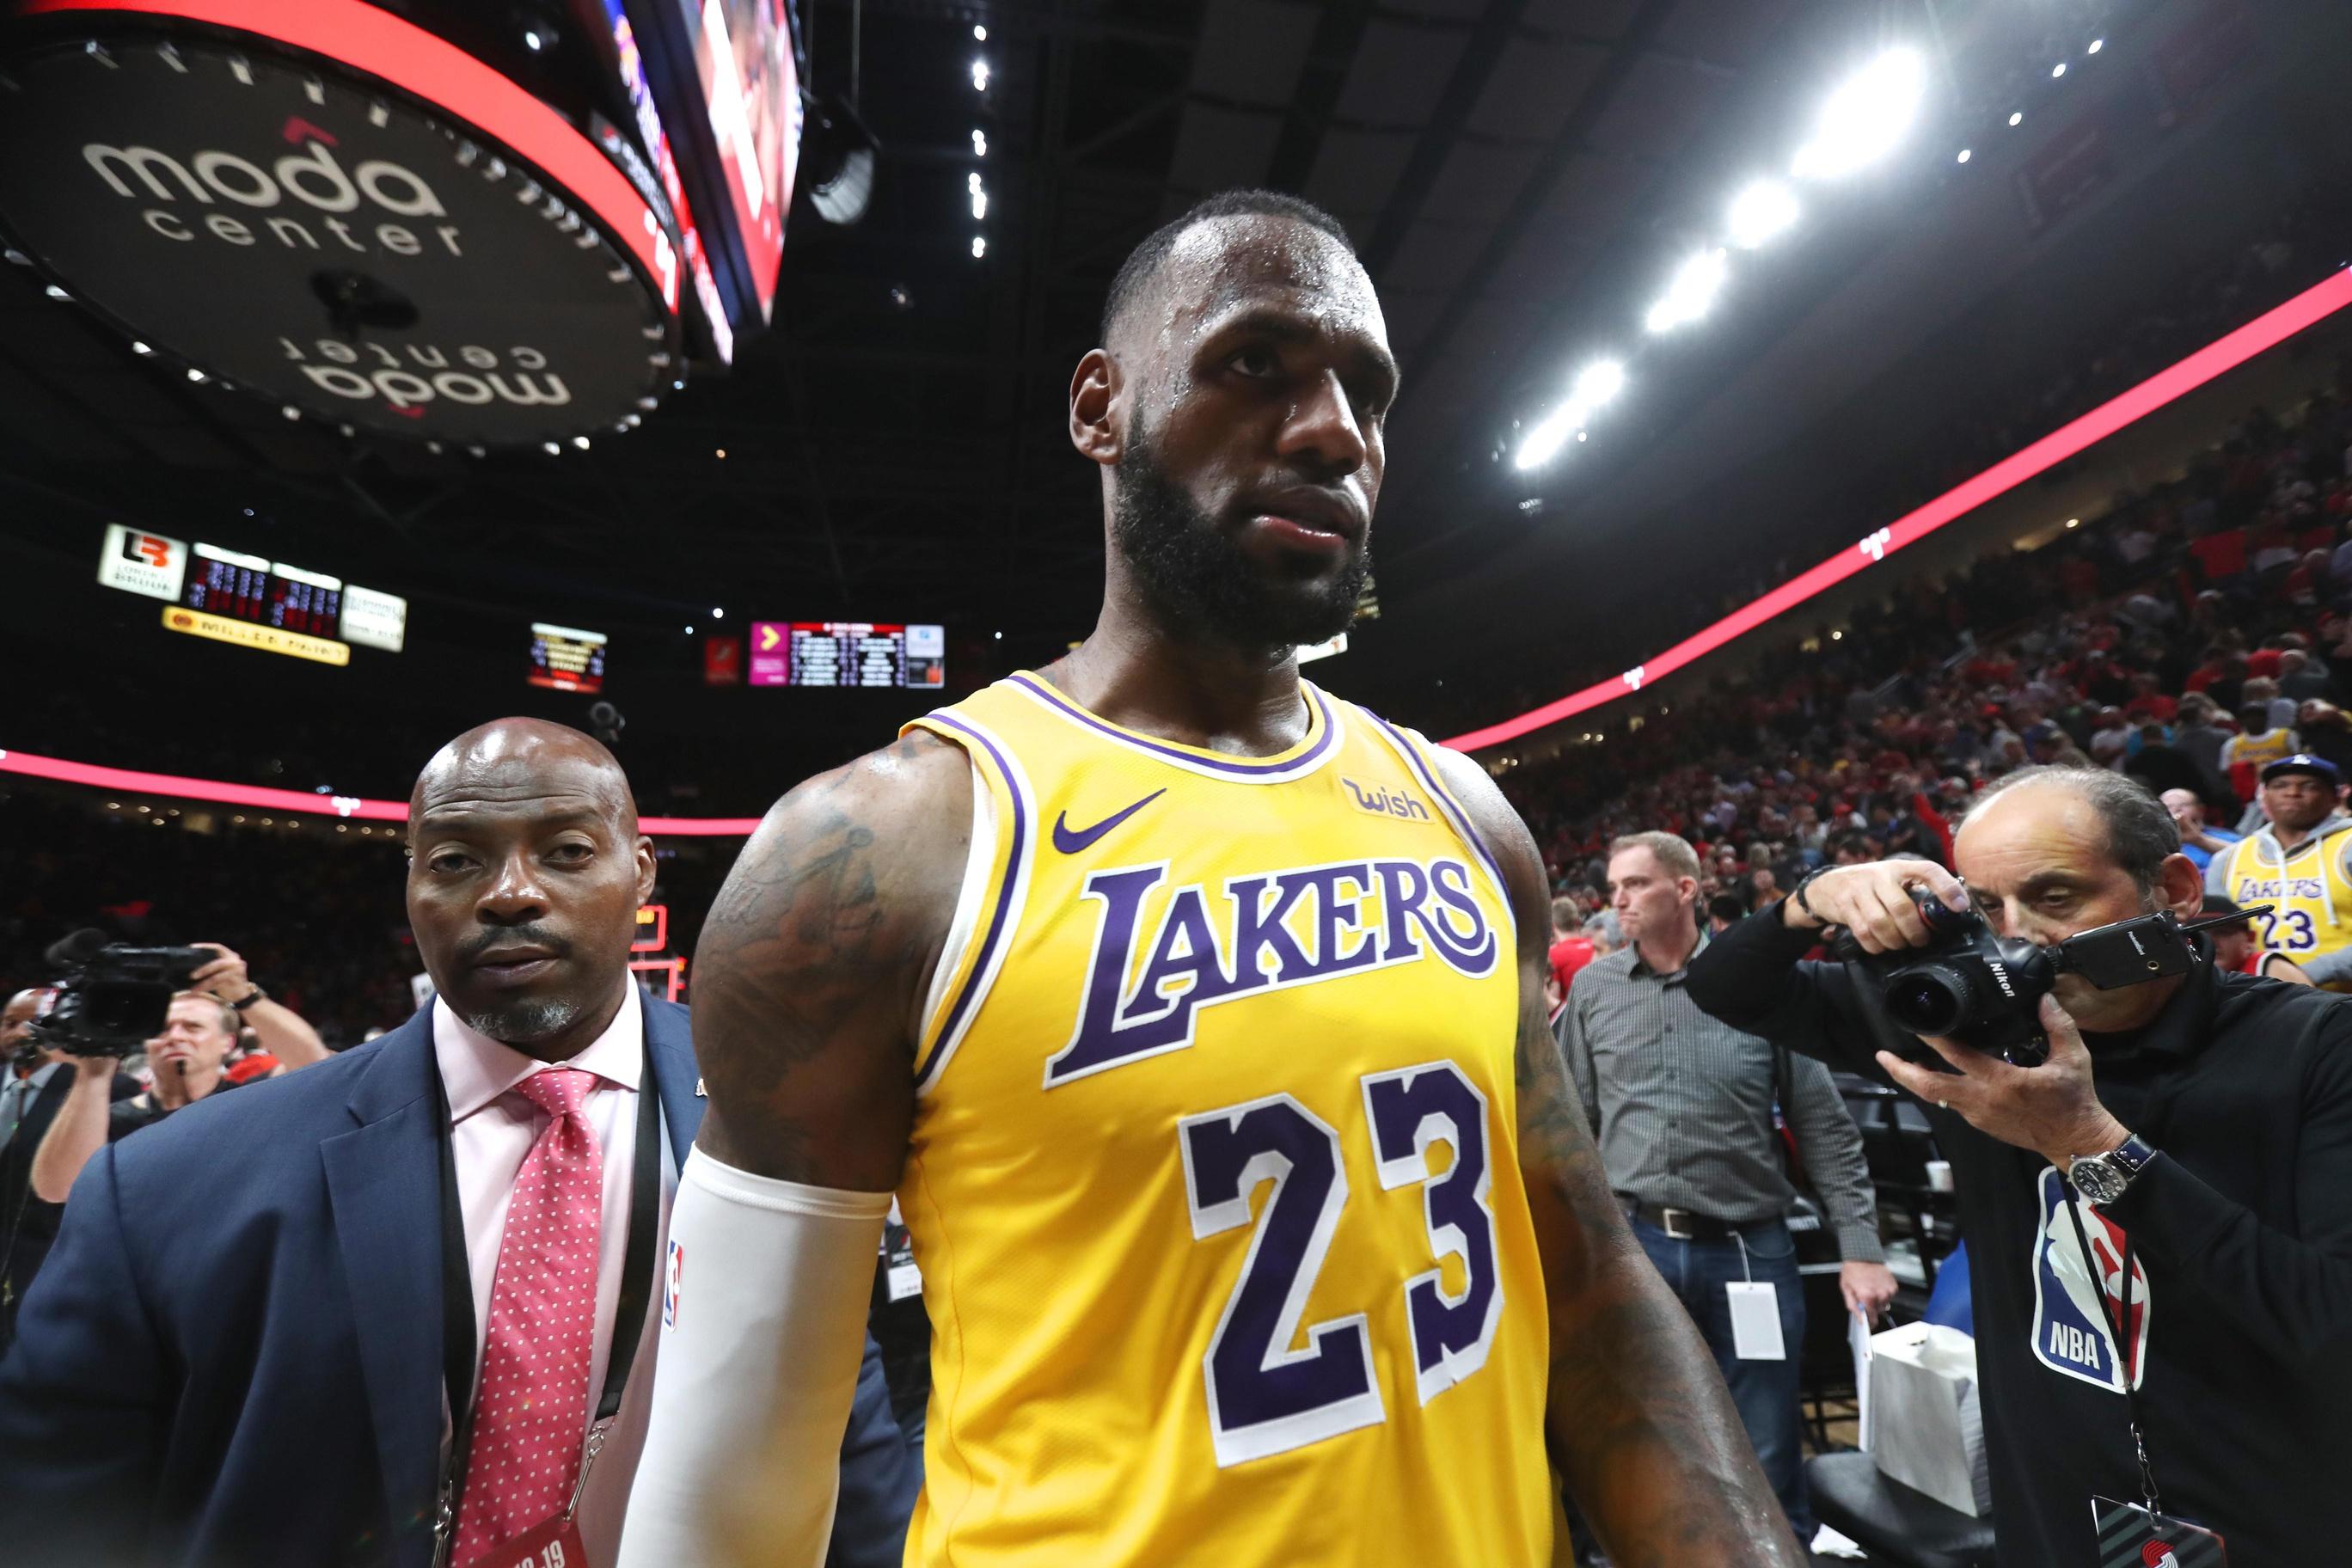 976a8680cf1 Former NBA All-Star blasts LeBron James for GOAT talk